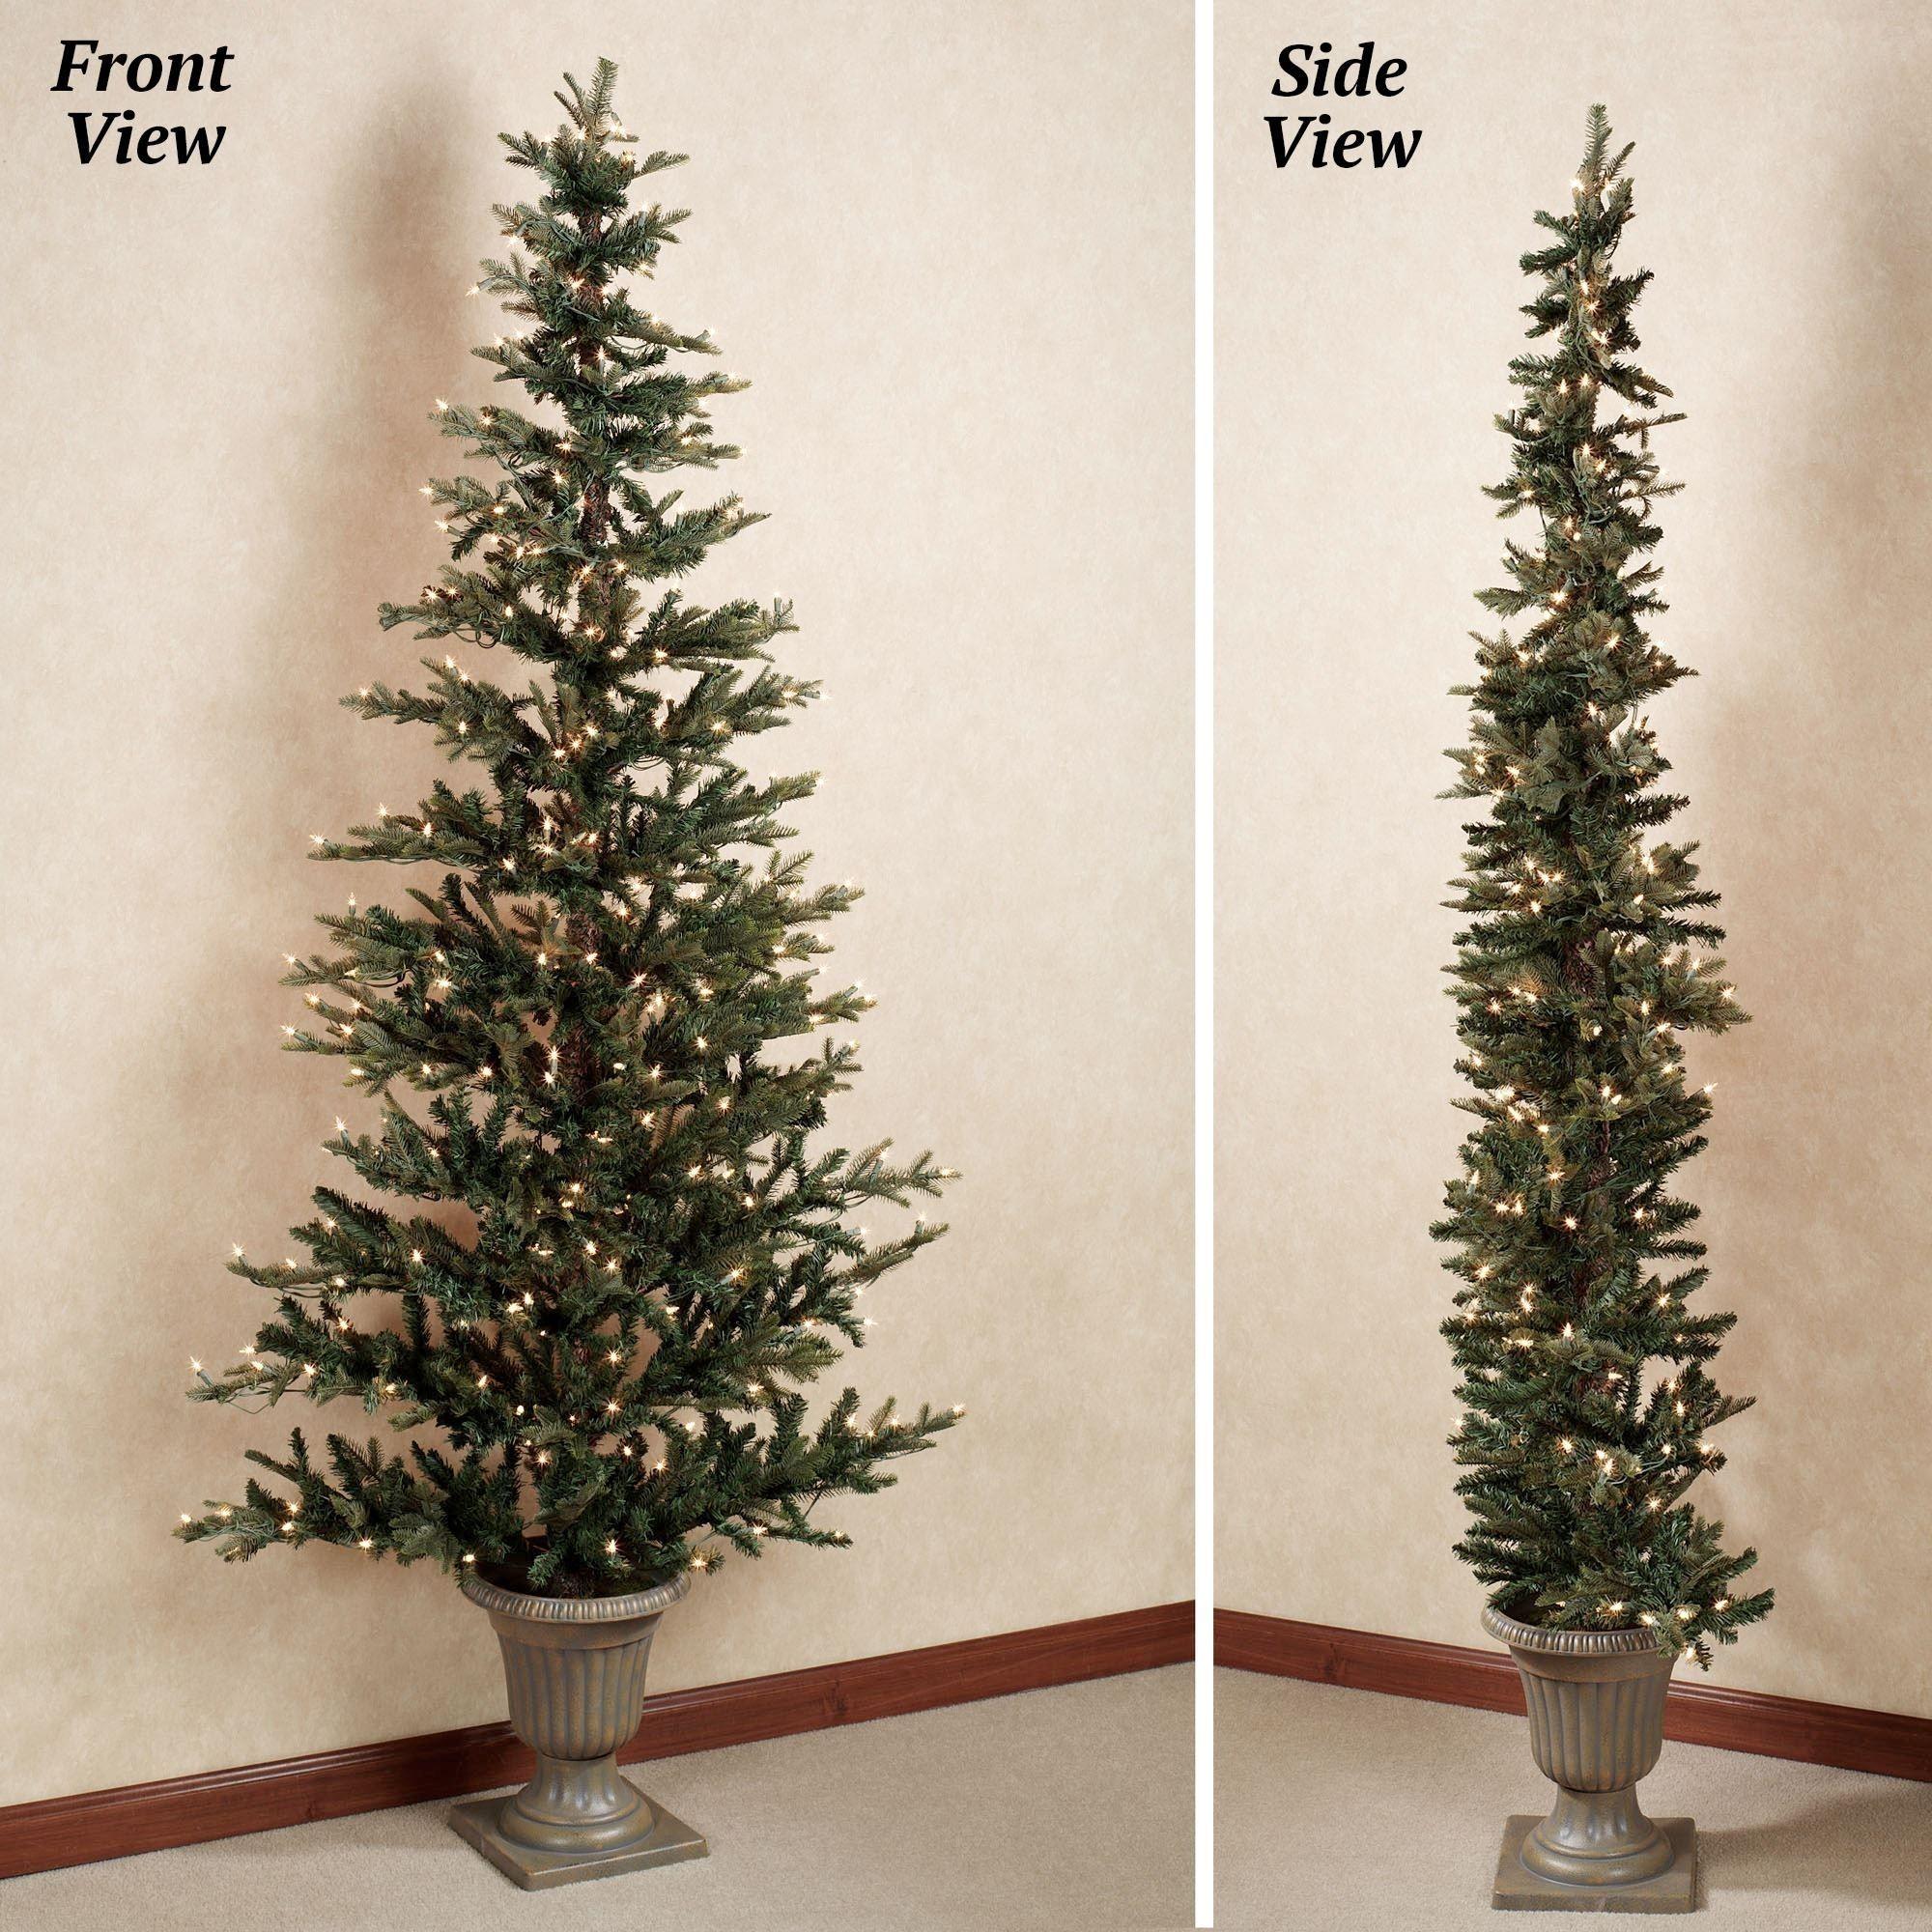 Flat Back Christmas Tree Ideas On Foter Flat Christmas Tree Small Space Christmas Tree Christmas Tree In Urn